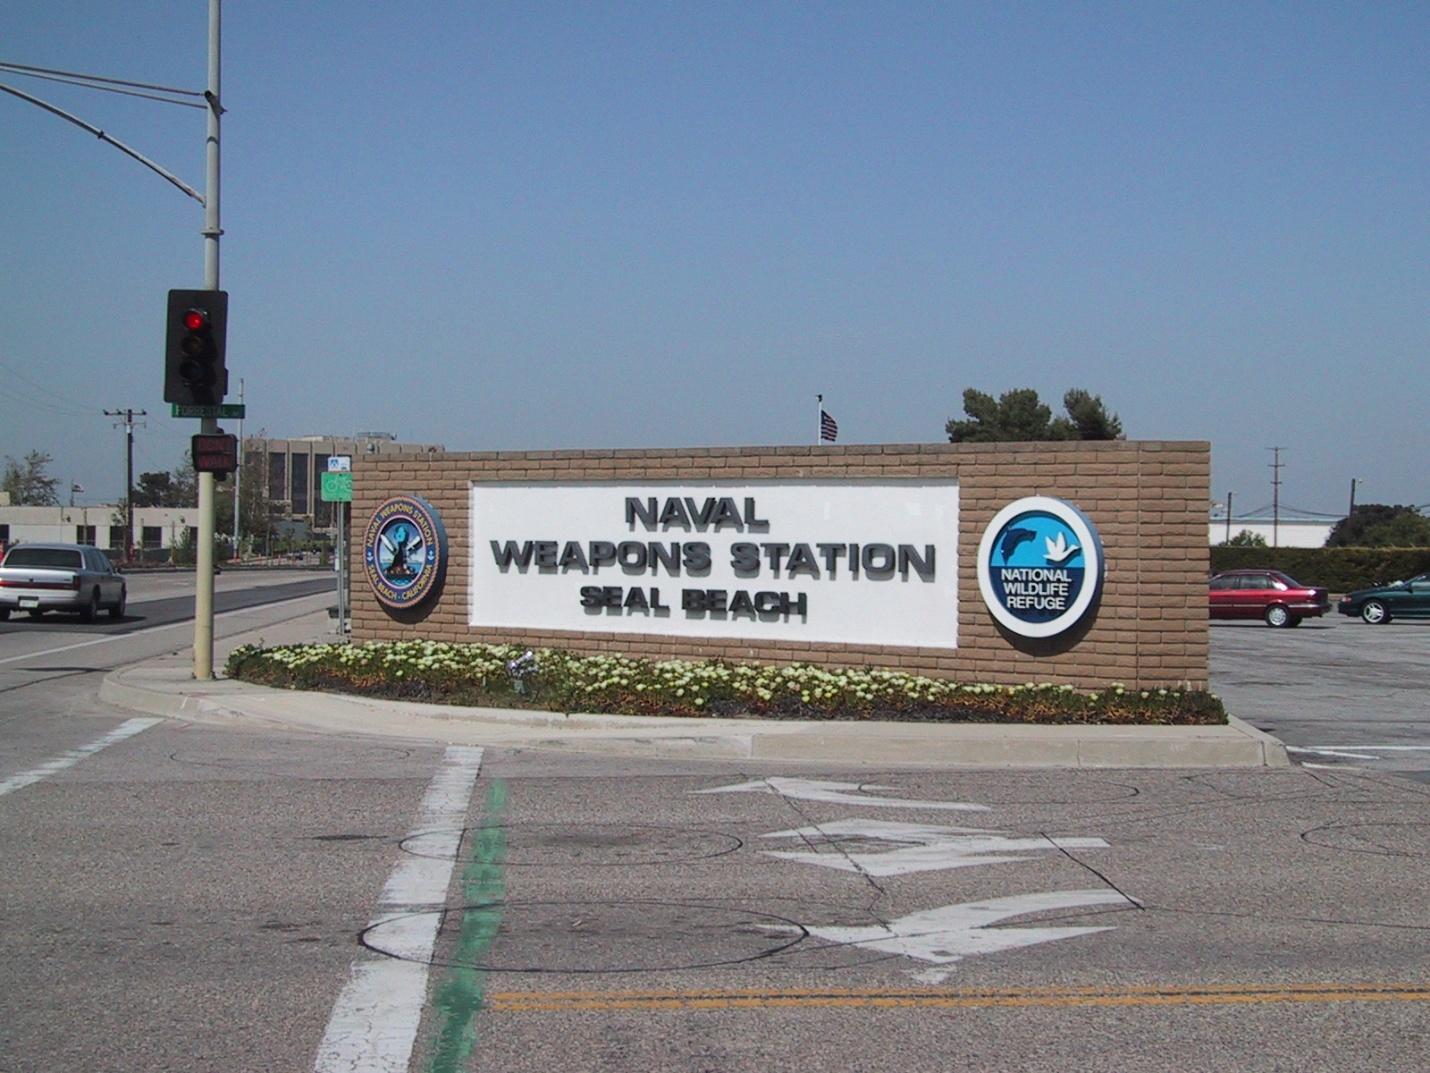 C:UsersCoeffDesktopArmy Base PicsNWS Seal Beach Navy Base in Seal Beach, CA5663132484_68d9cdc742_o.jpg